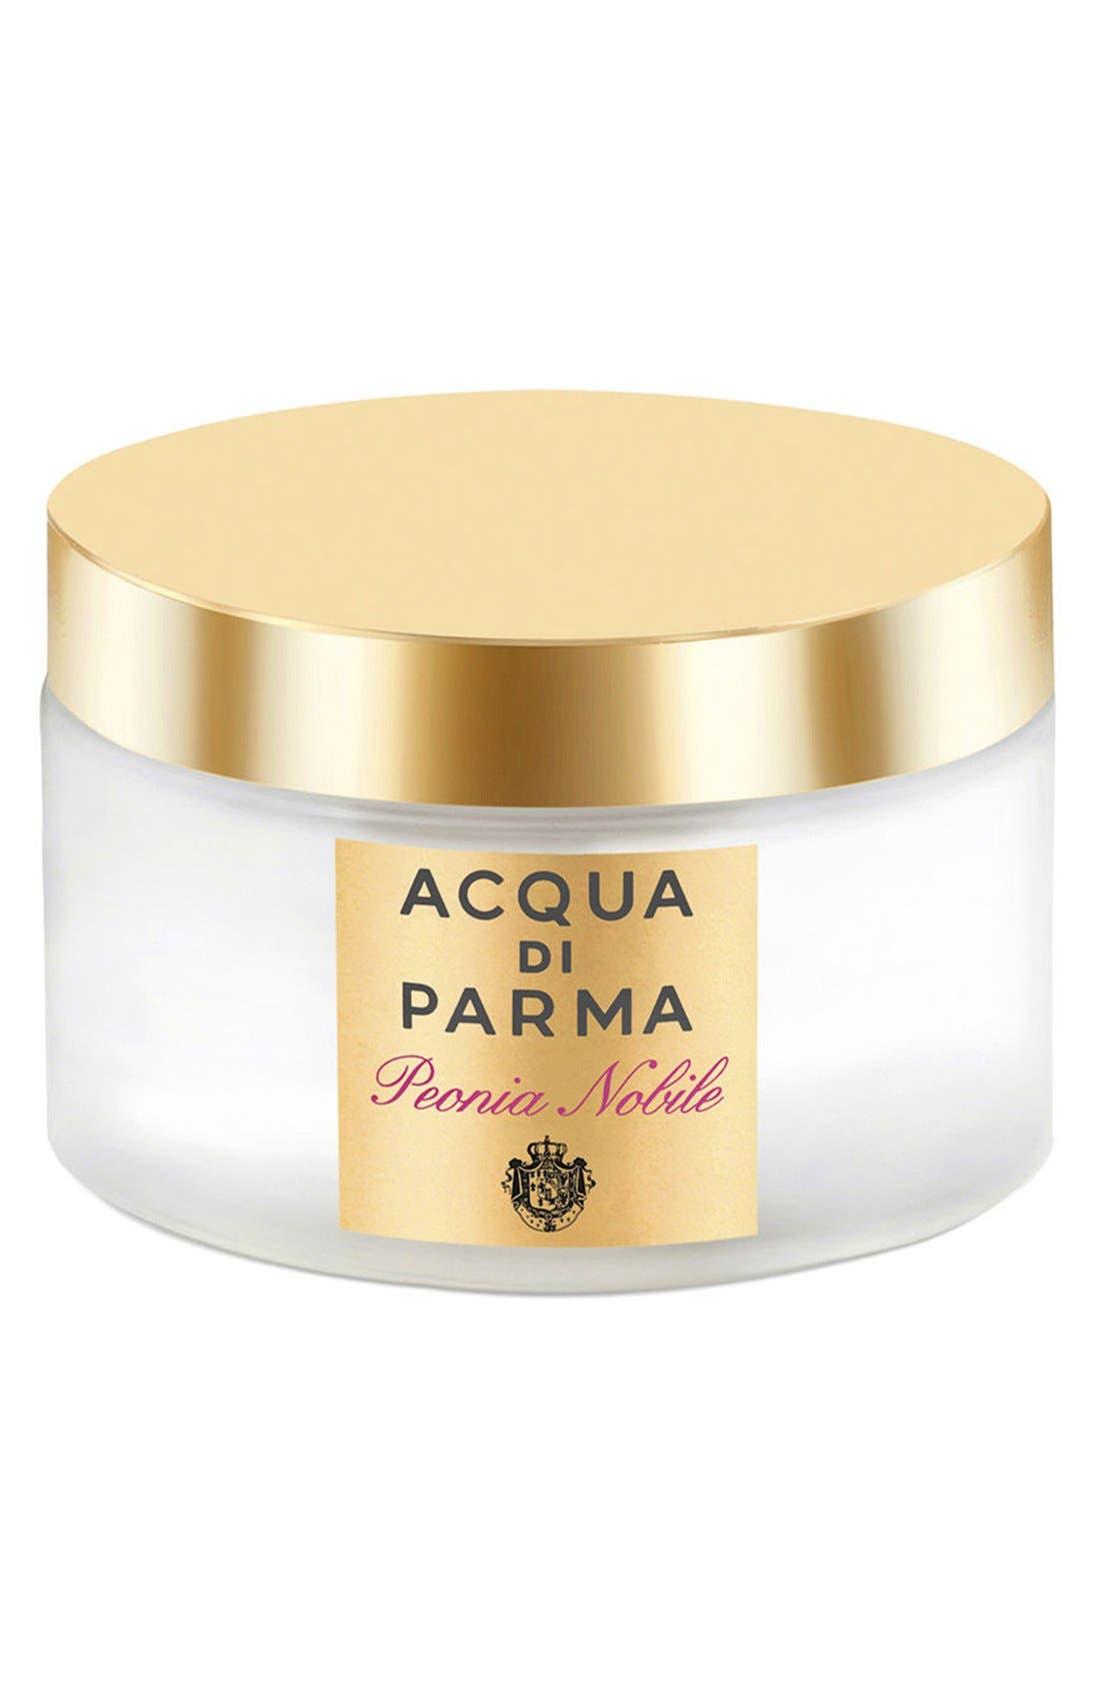 'Peonia Nobile' Luxurious Body Cream,                             Main thumbnail 1, color,                             NO COLOR